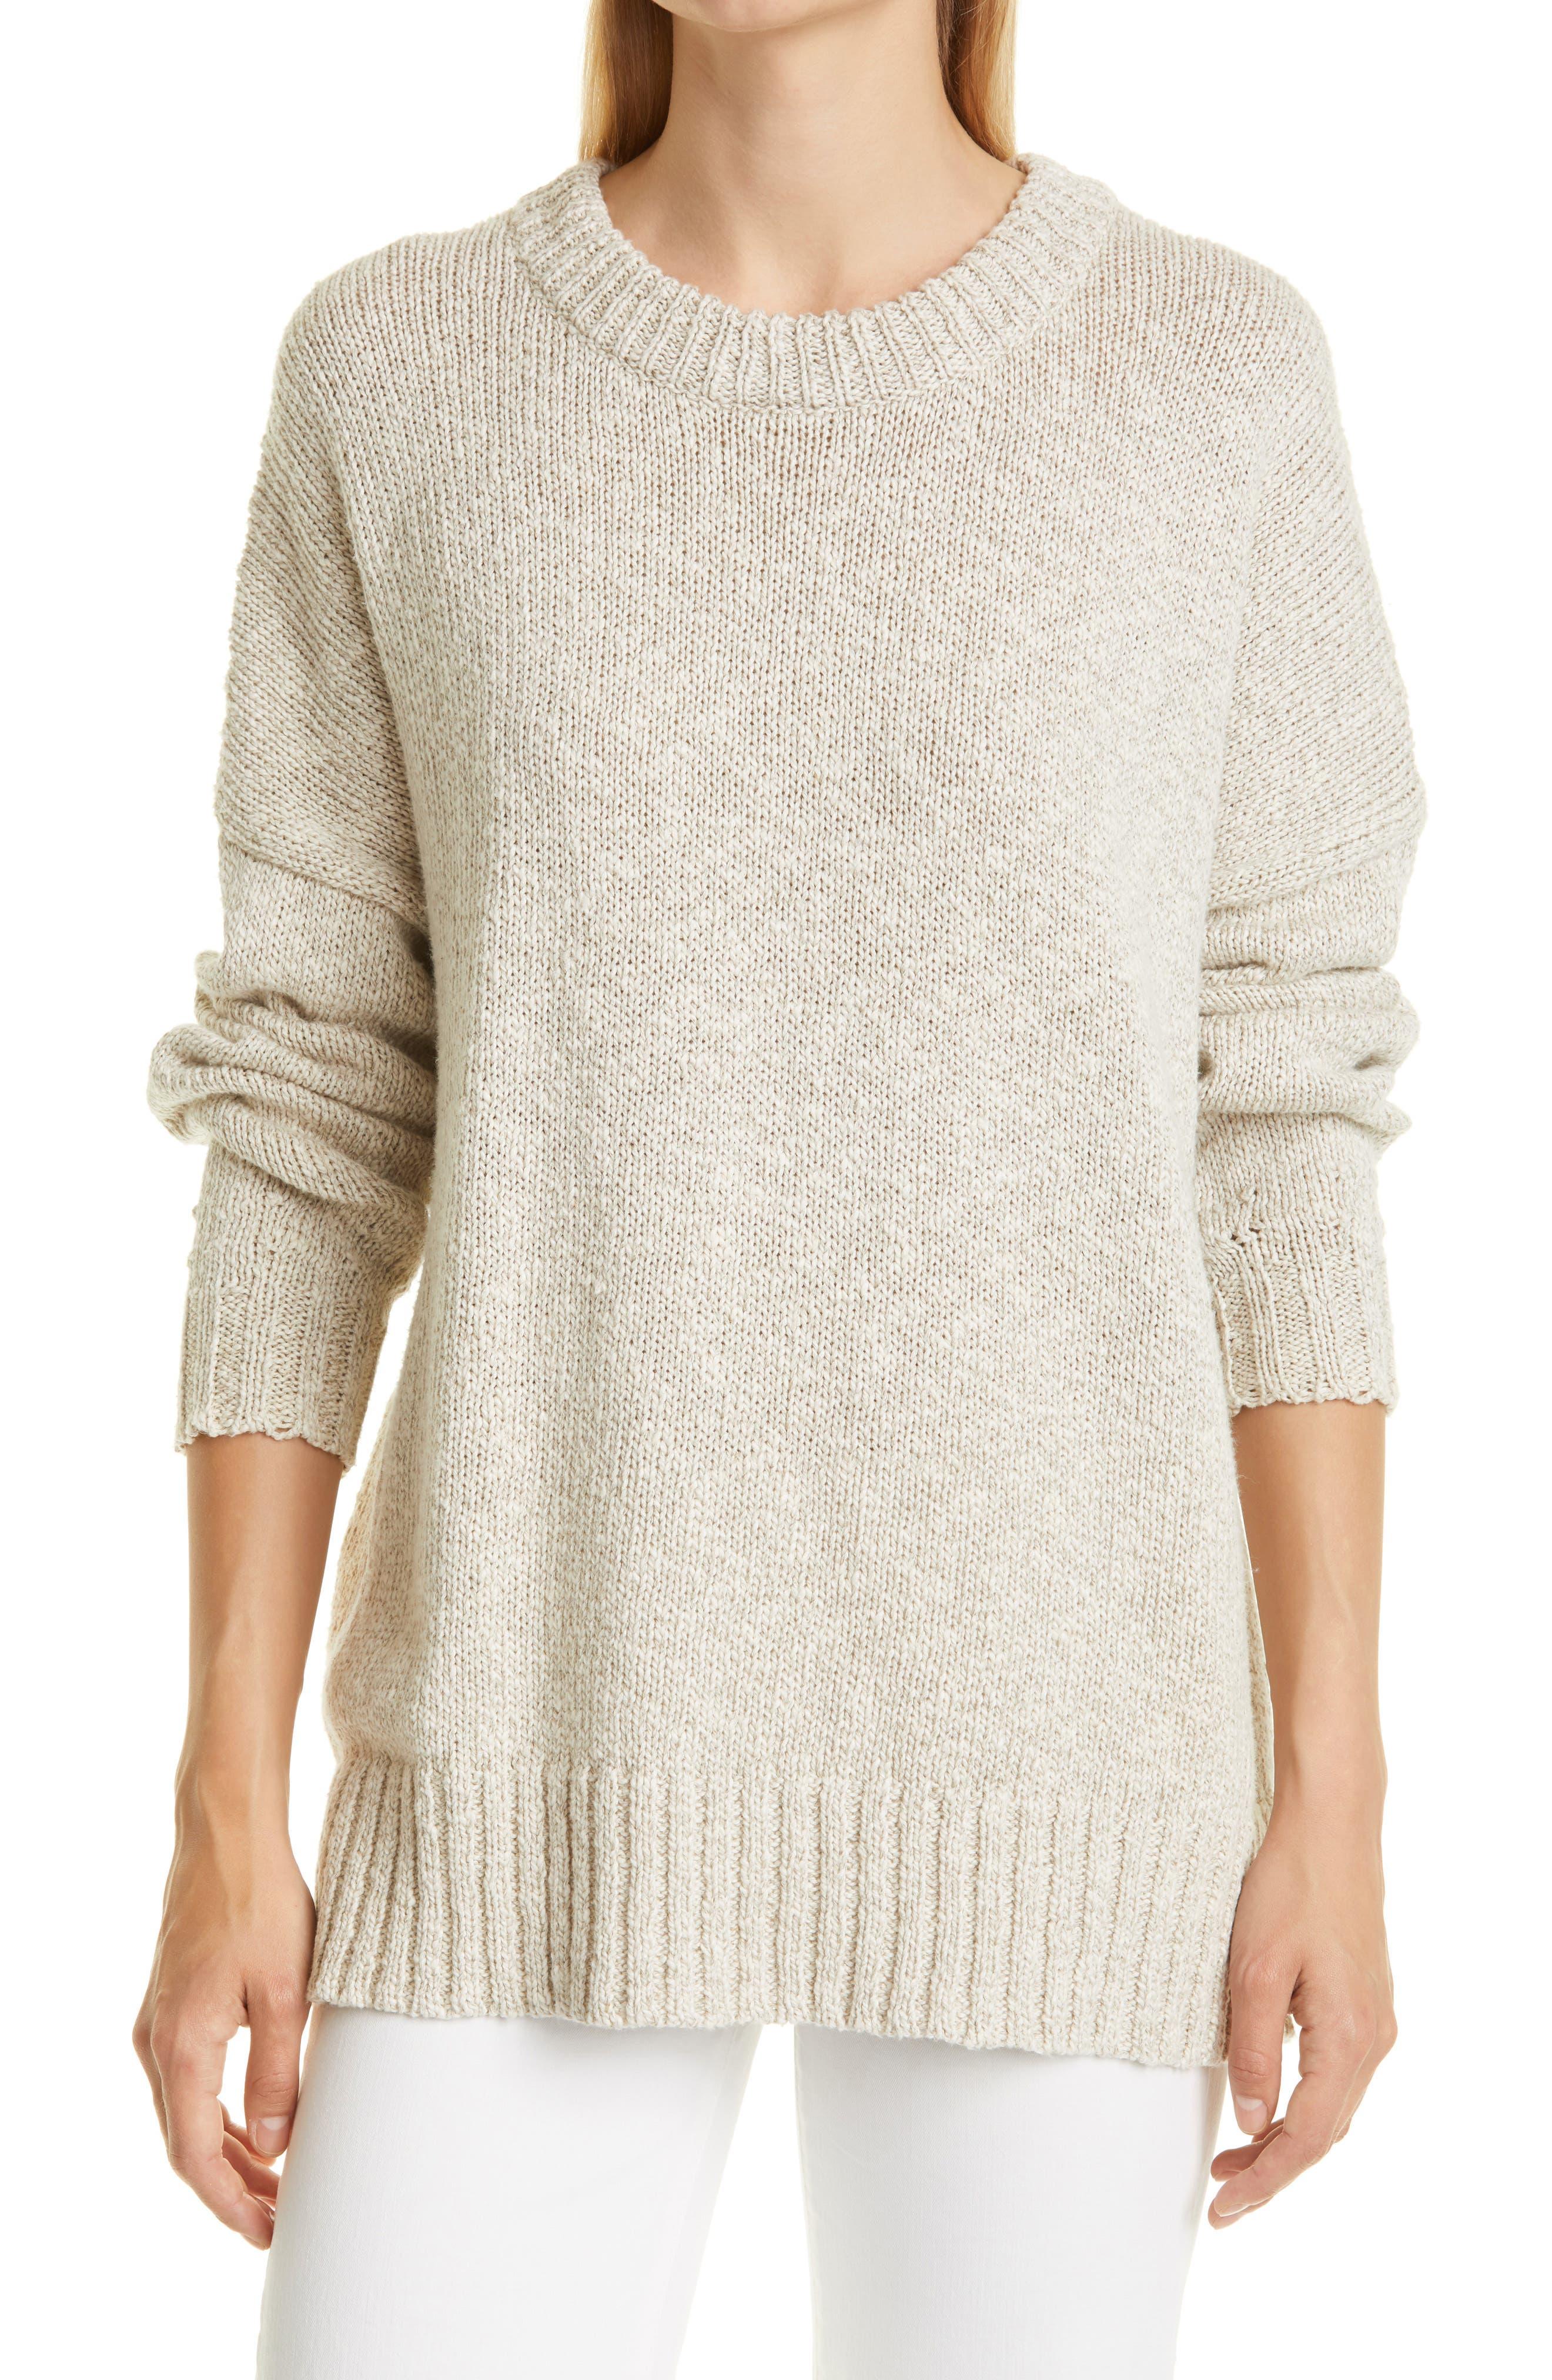 Cotton & Linen Crewneck Sweater